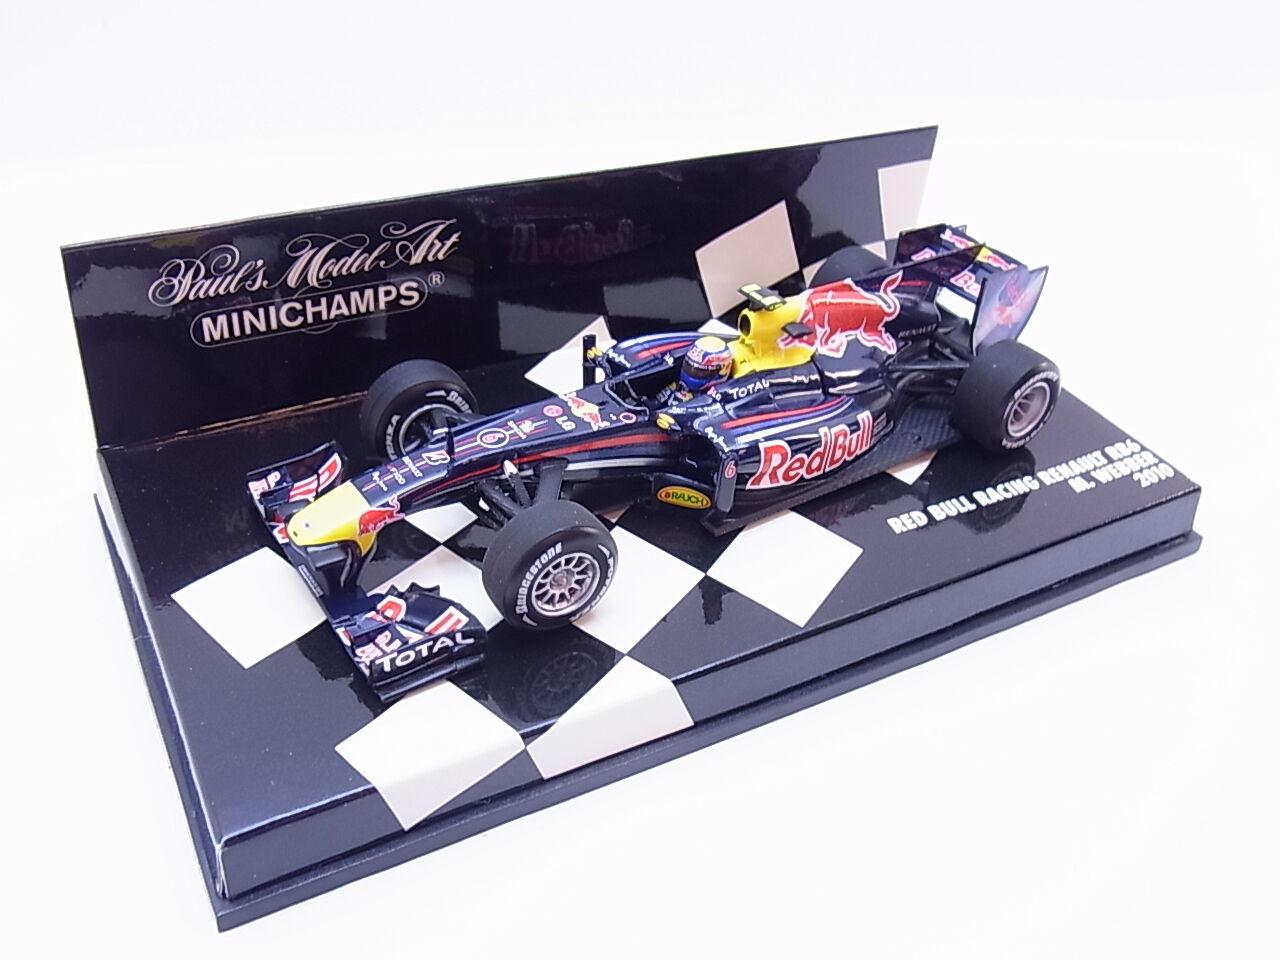 Lot 26224   MINICHAMPS 410100006 rouge Bull Racing Renault M WEBBER 2010 1 43 neuf dans sa boîte